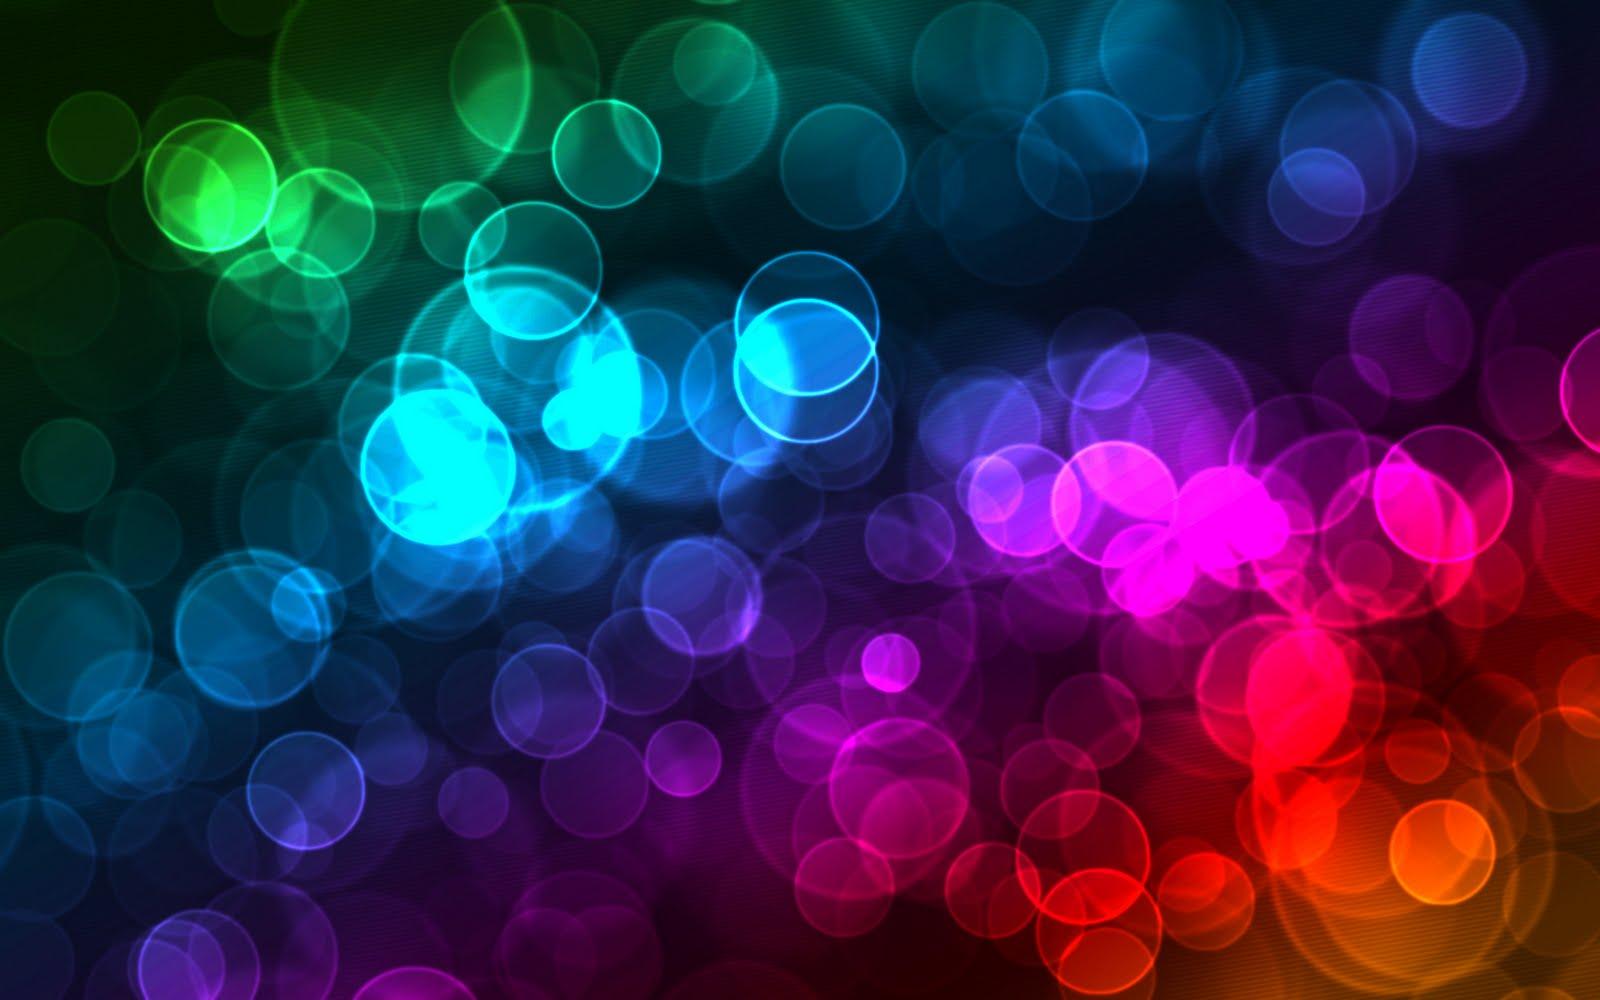 Nentedu Abstract Digital Bubbles HD Wallpapers